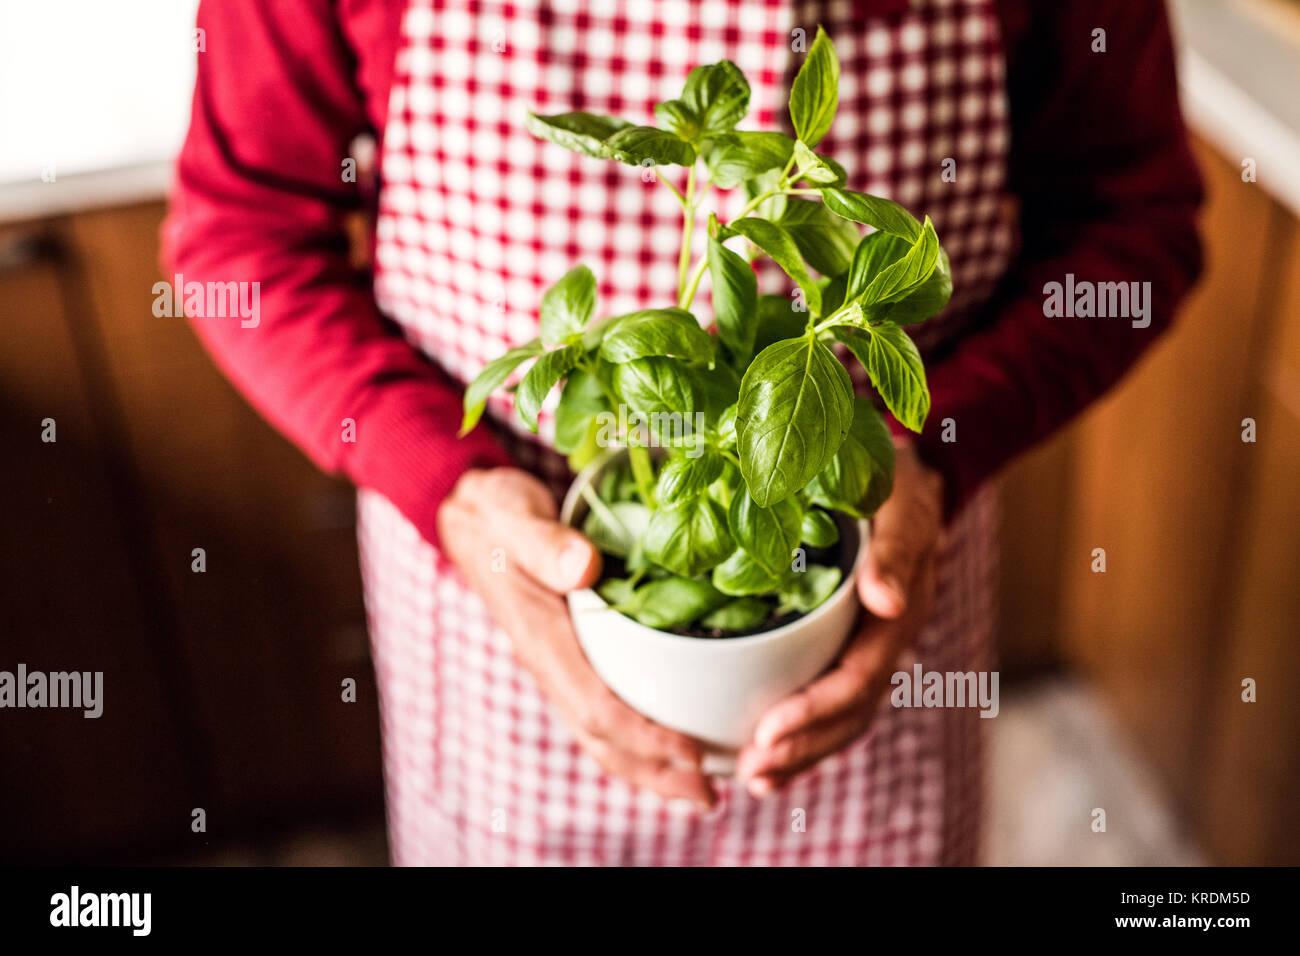 Senior man preparing food in the kitchen. - Stock Image